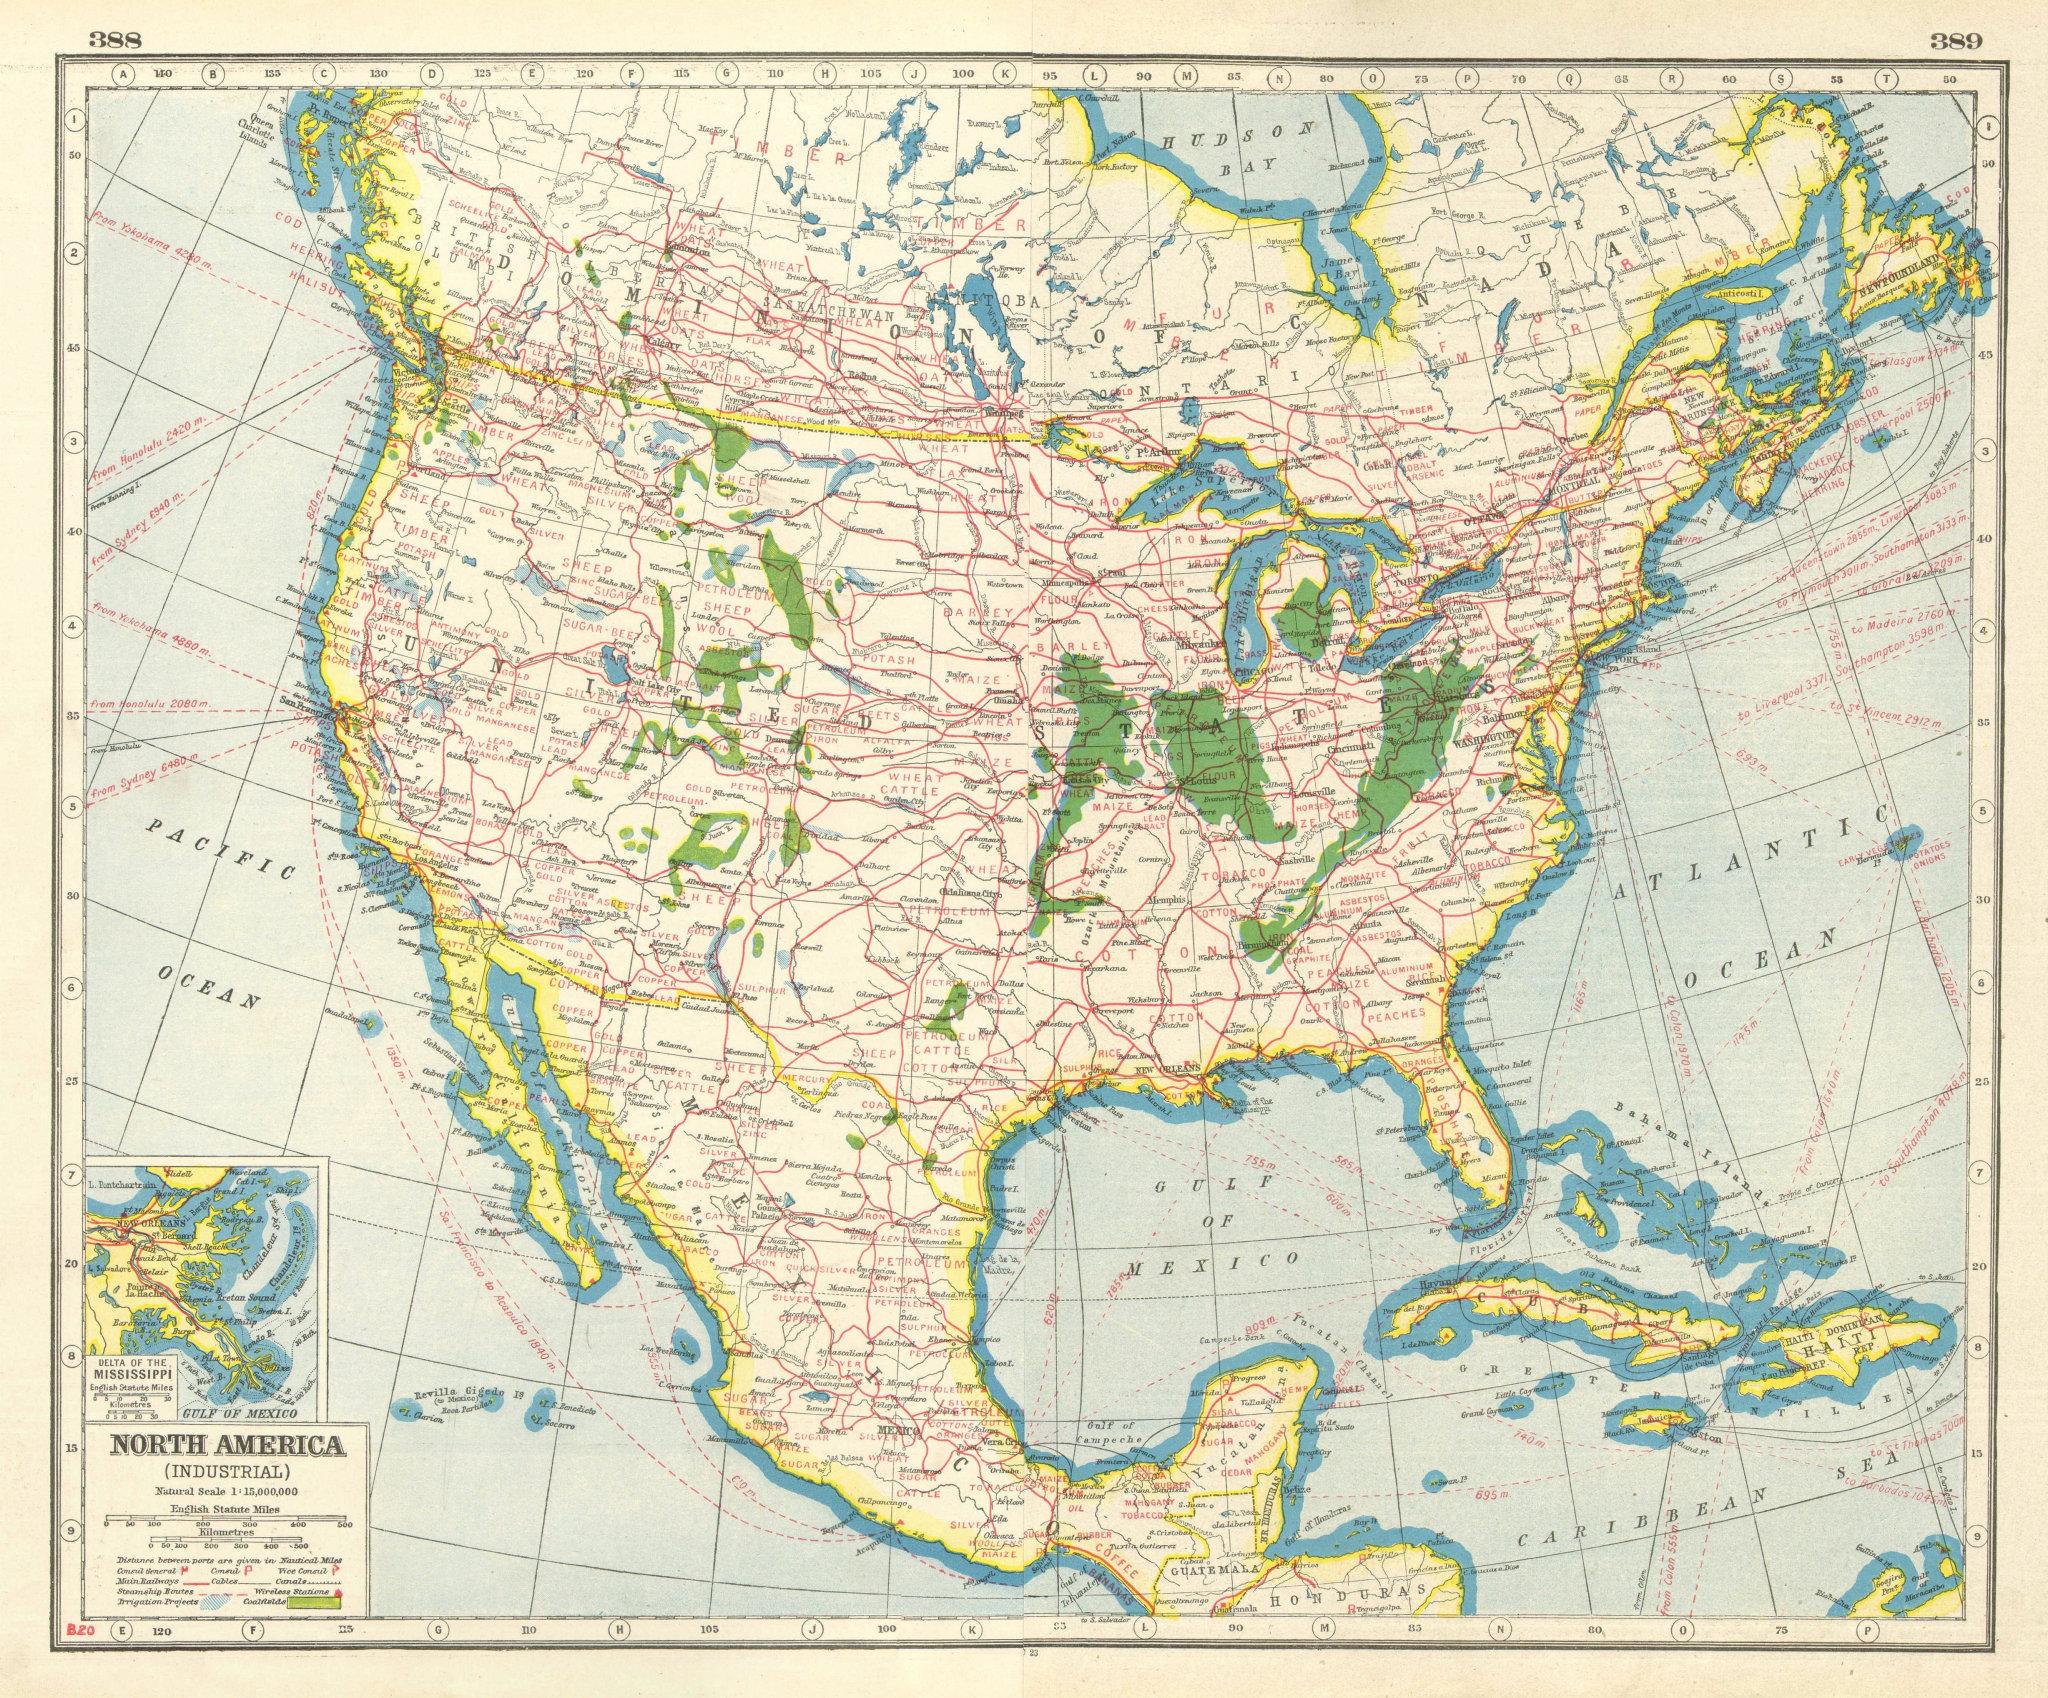 Associate Product NORTH AMERICA INDUSTRIES. USA Canada. Coalfields Irrigation Railroads 1920 map